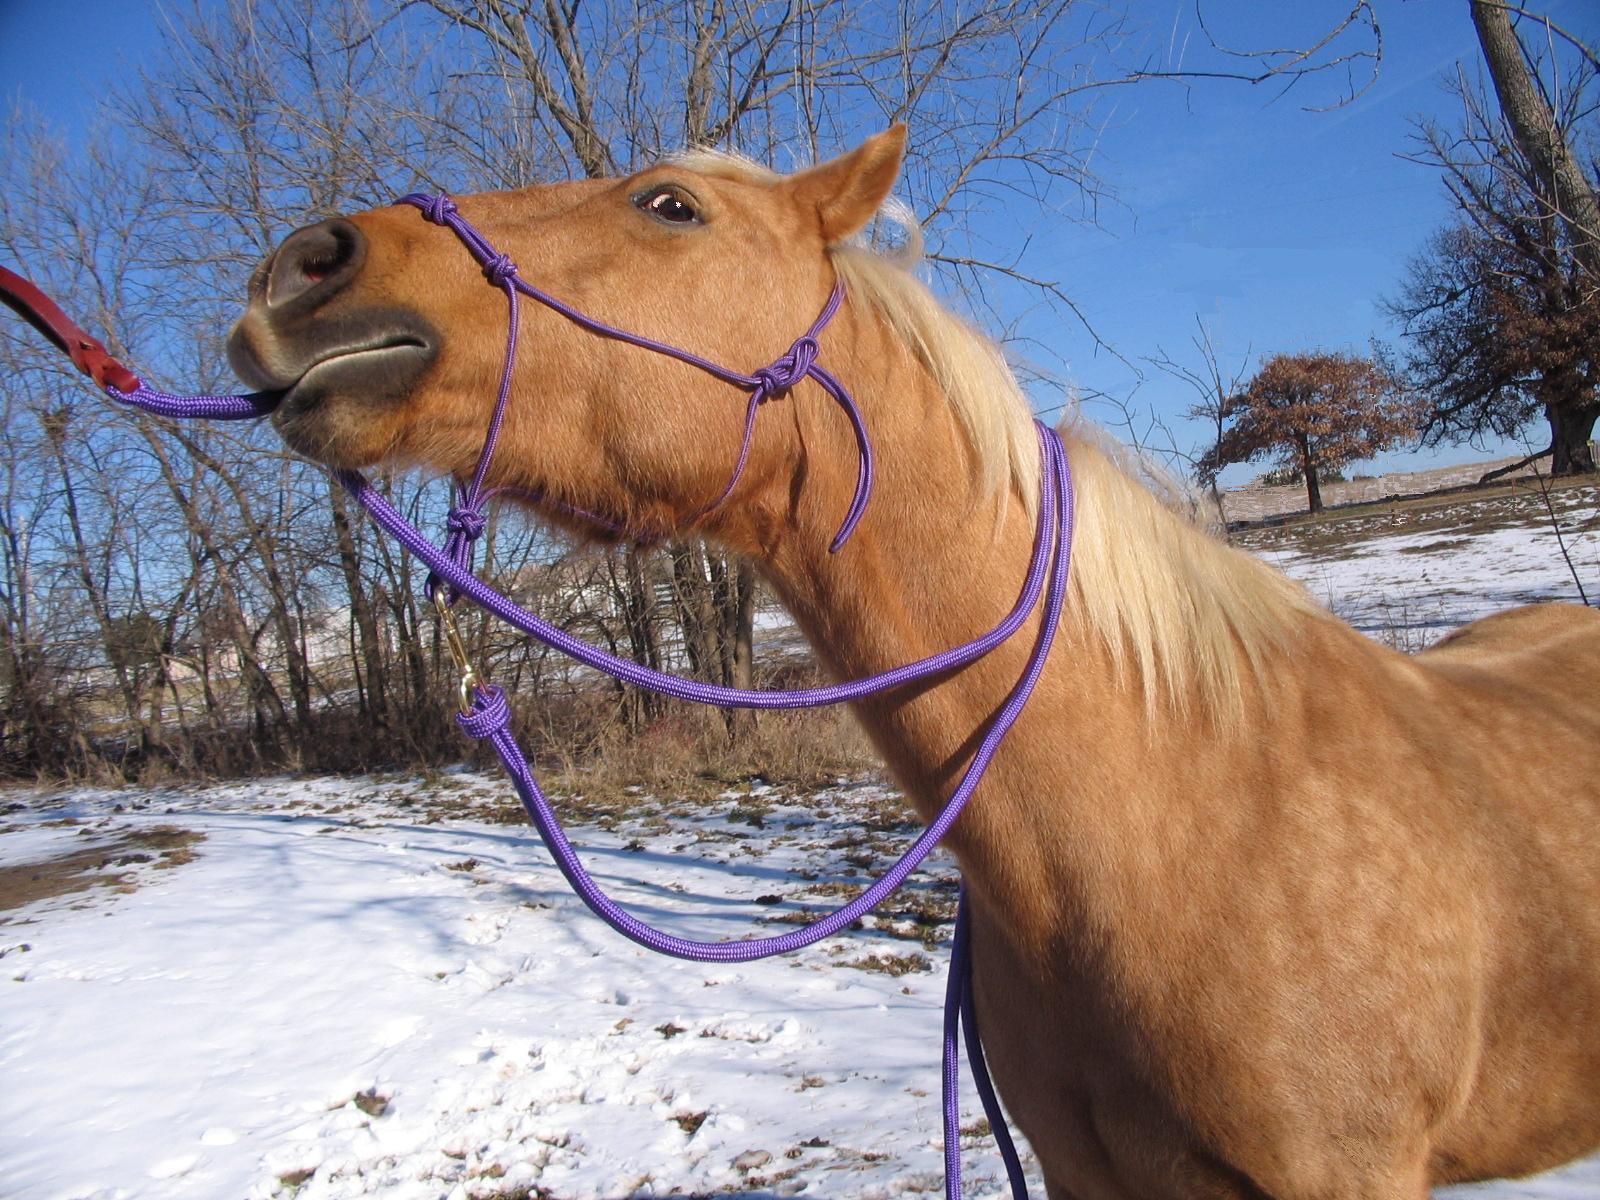 THOMEY NATURAL HORSE TRAINING HALTER & LEAD ROPE  PURPLE